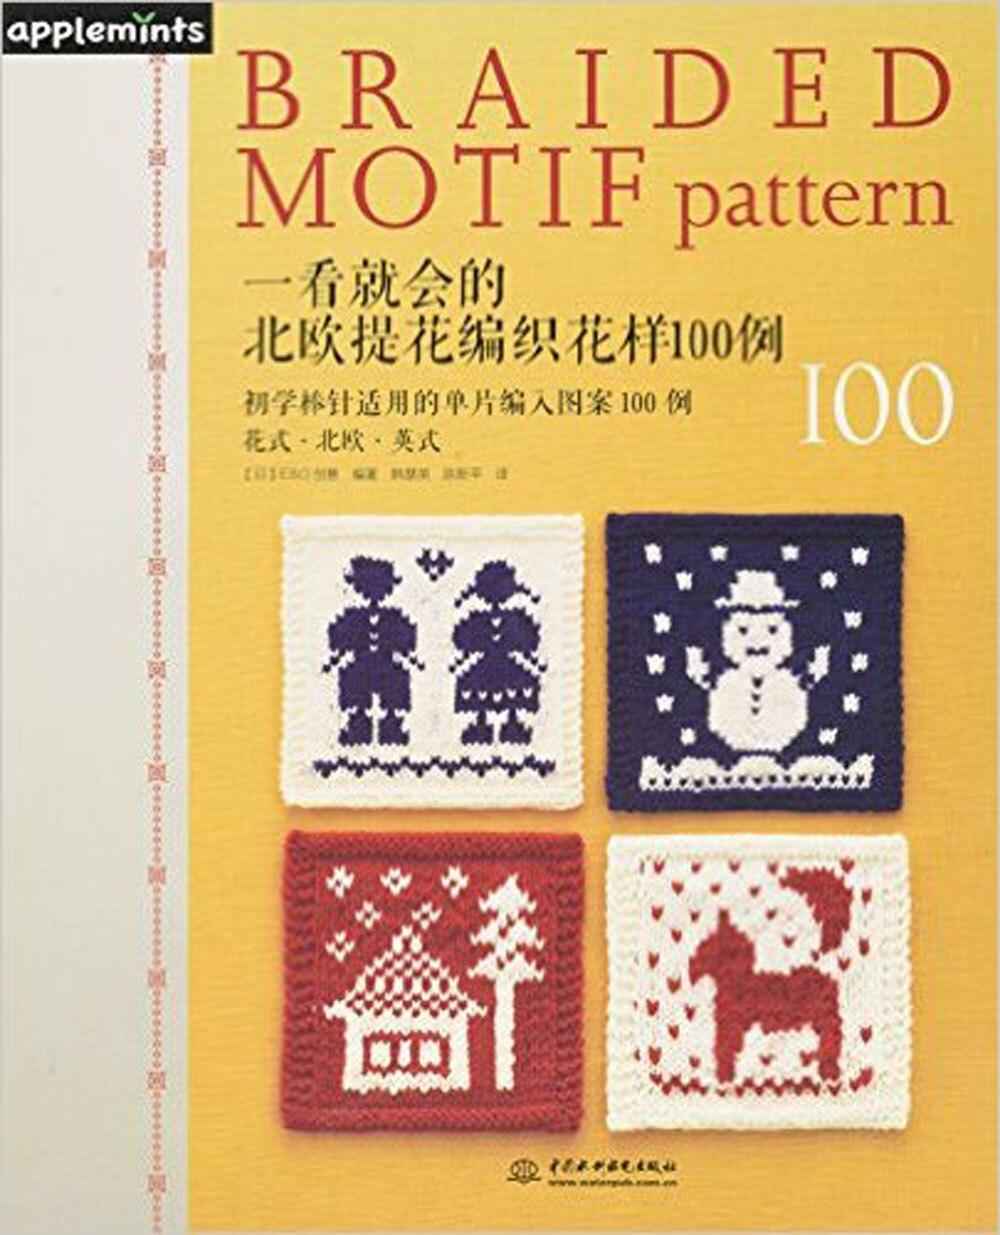 Braided Motif Pattern 100 book with Nordic and British Square diamond patterns Chinese knitting diy books audioquest hdmi diamond 0 6m braided